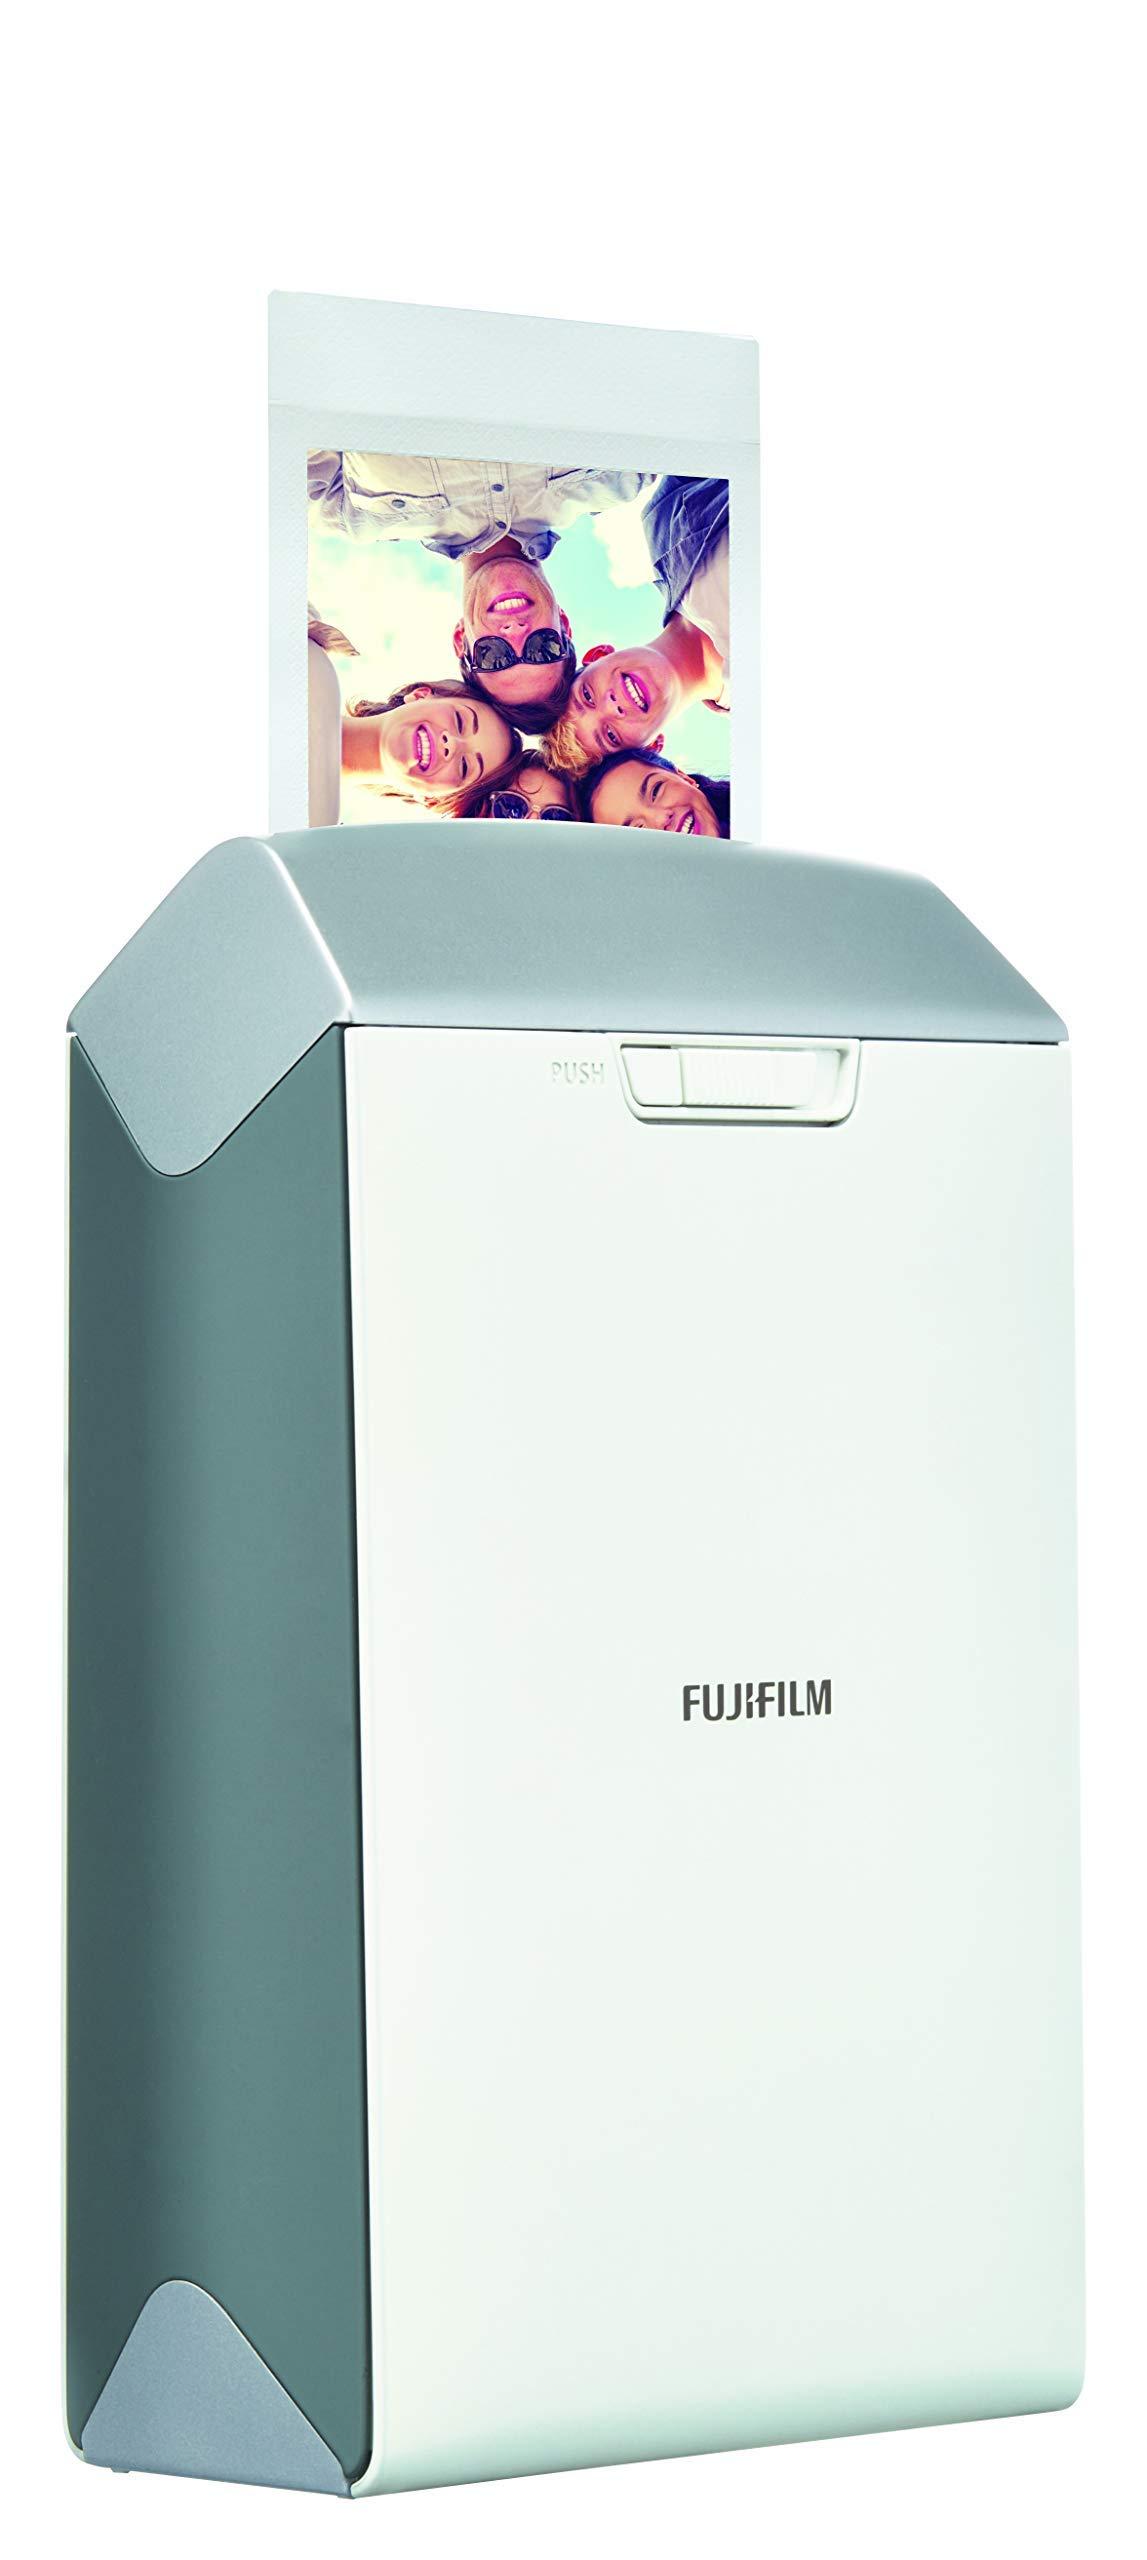 Fujifilm INSTAX Share SP-2 Mobile Printer (Silver) (Renewed)